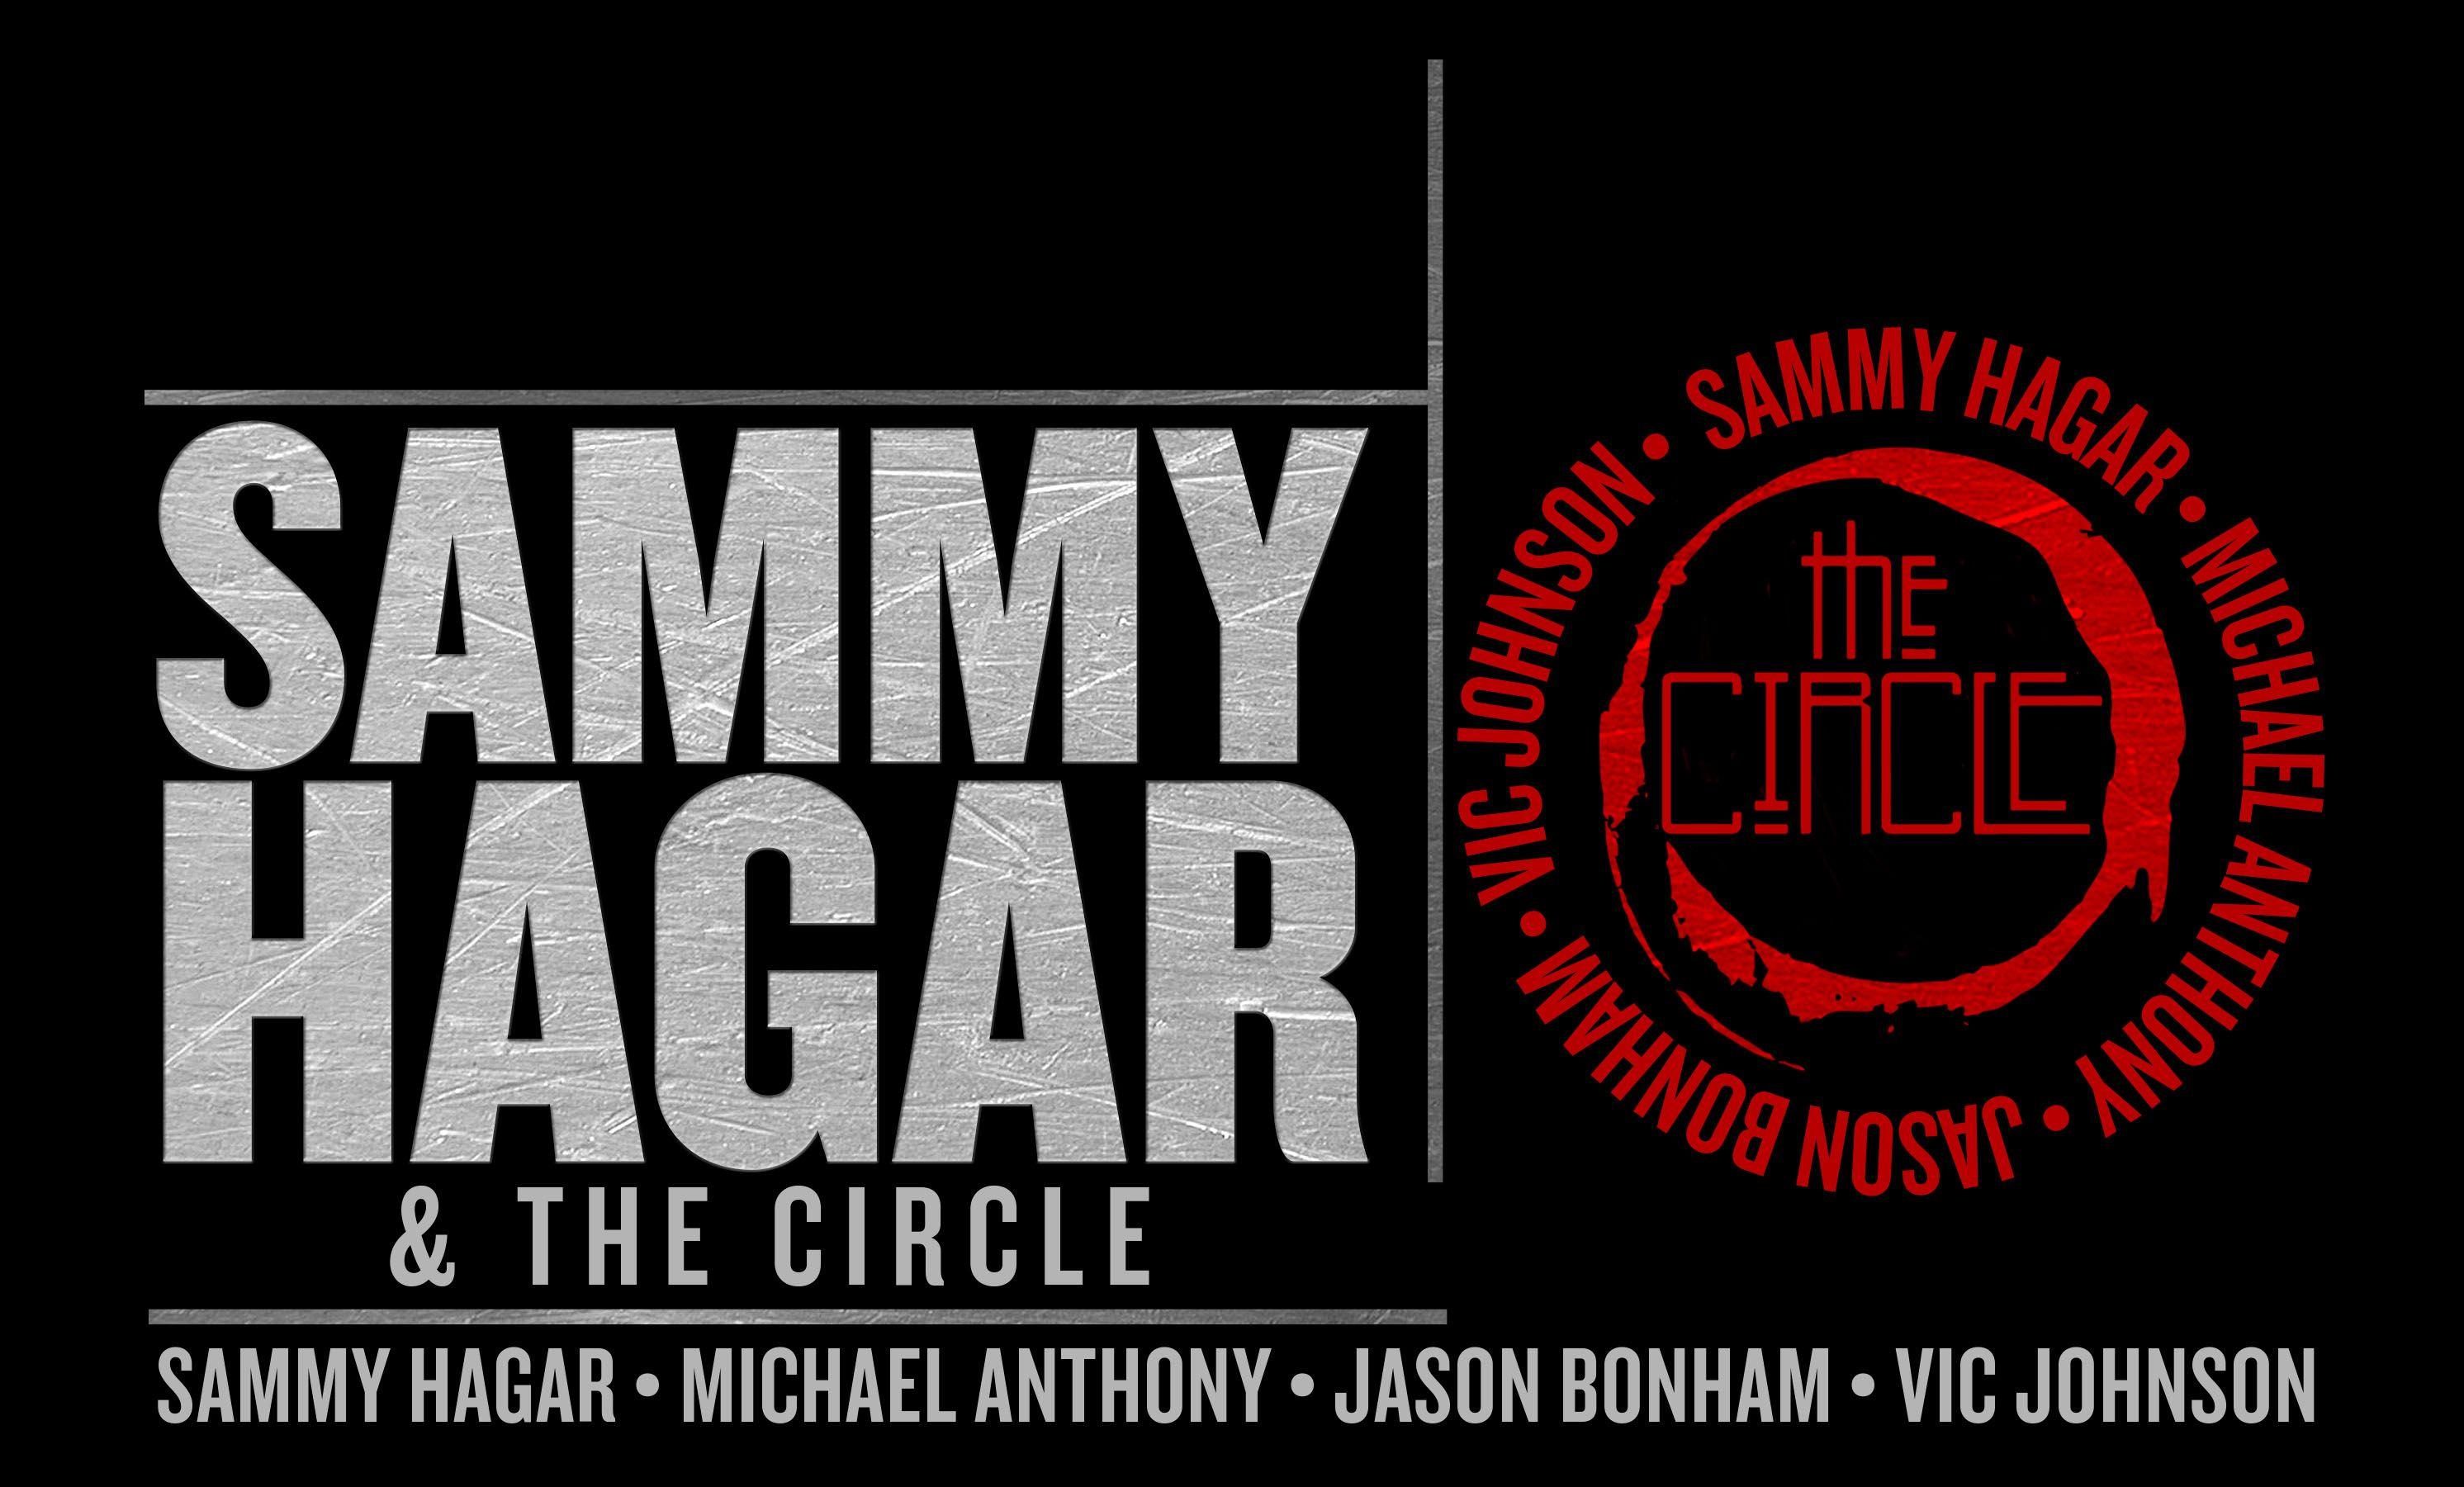 Sammy Hagar And The Circle Feat Michael Anthony Jason Bonham And Vic Johnson Coming September 5 2015 Sammy Hagar Michael Anthony Rock Music